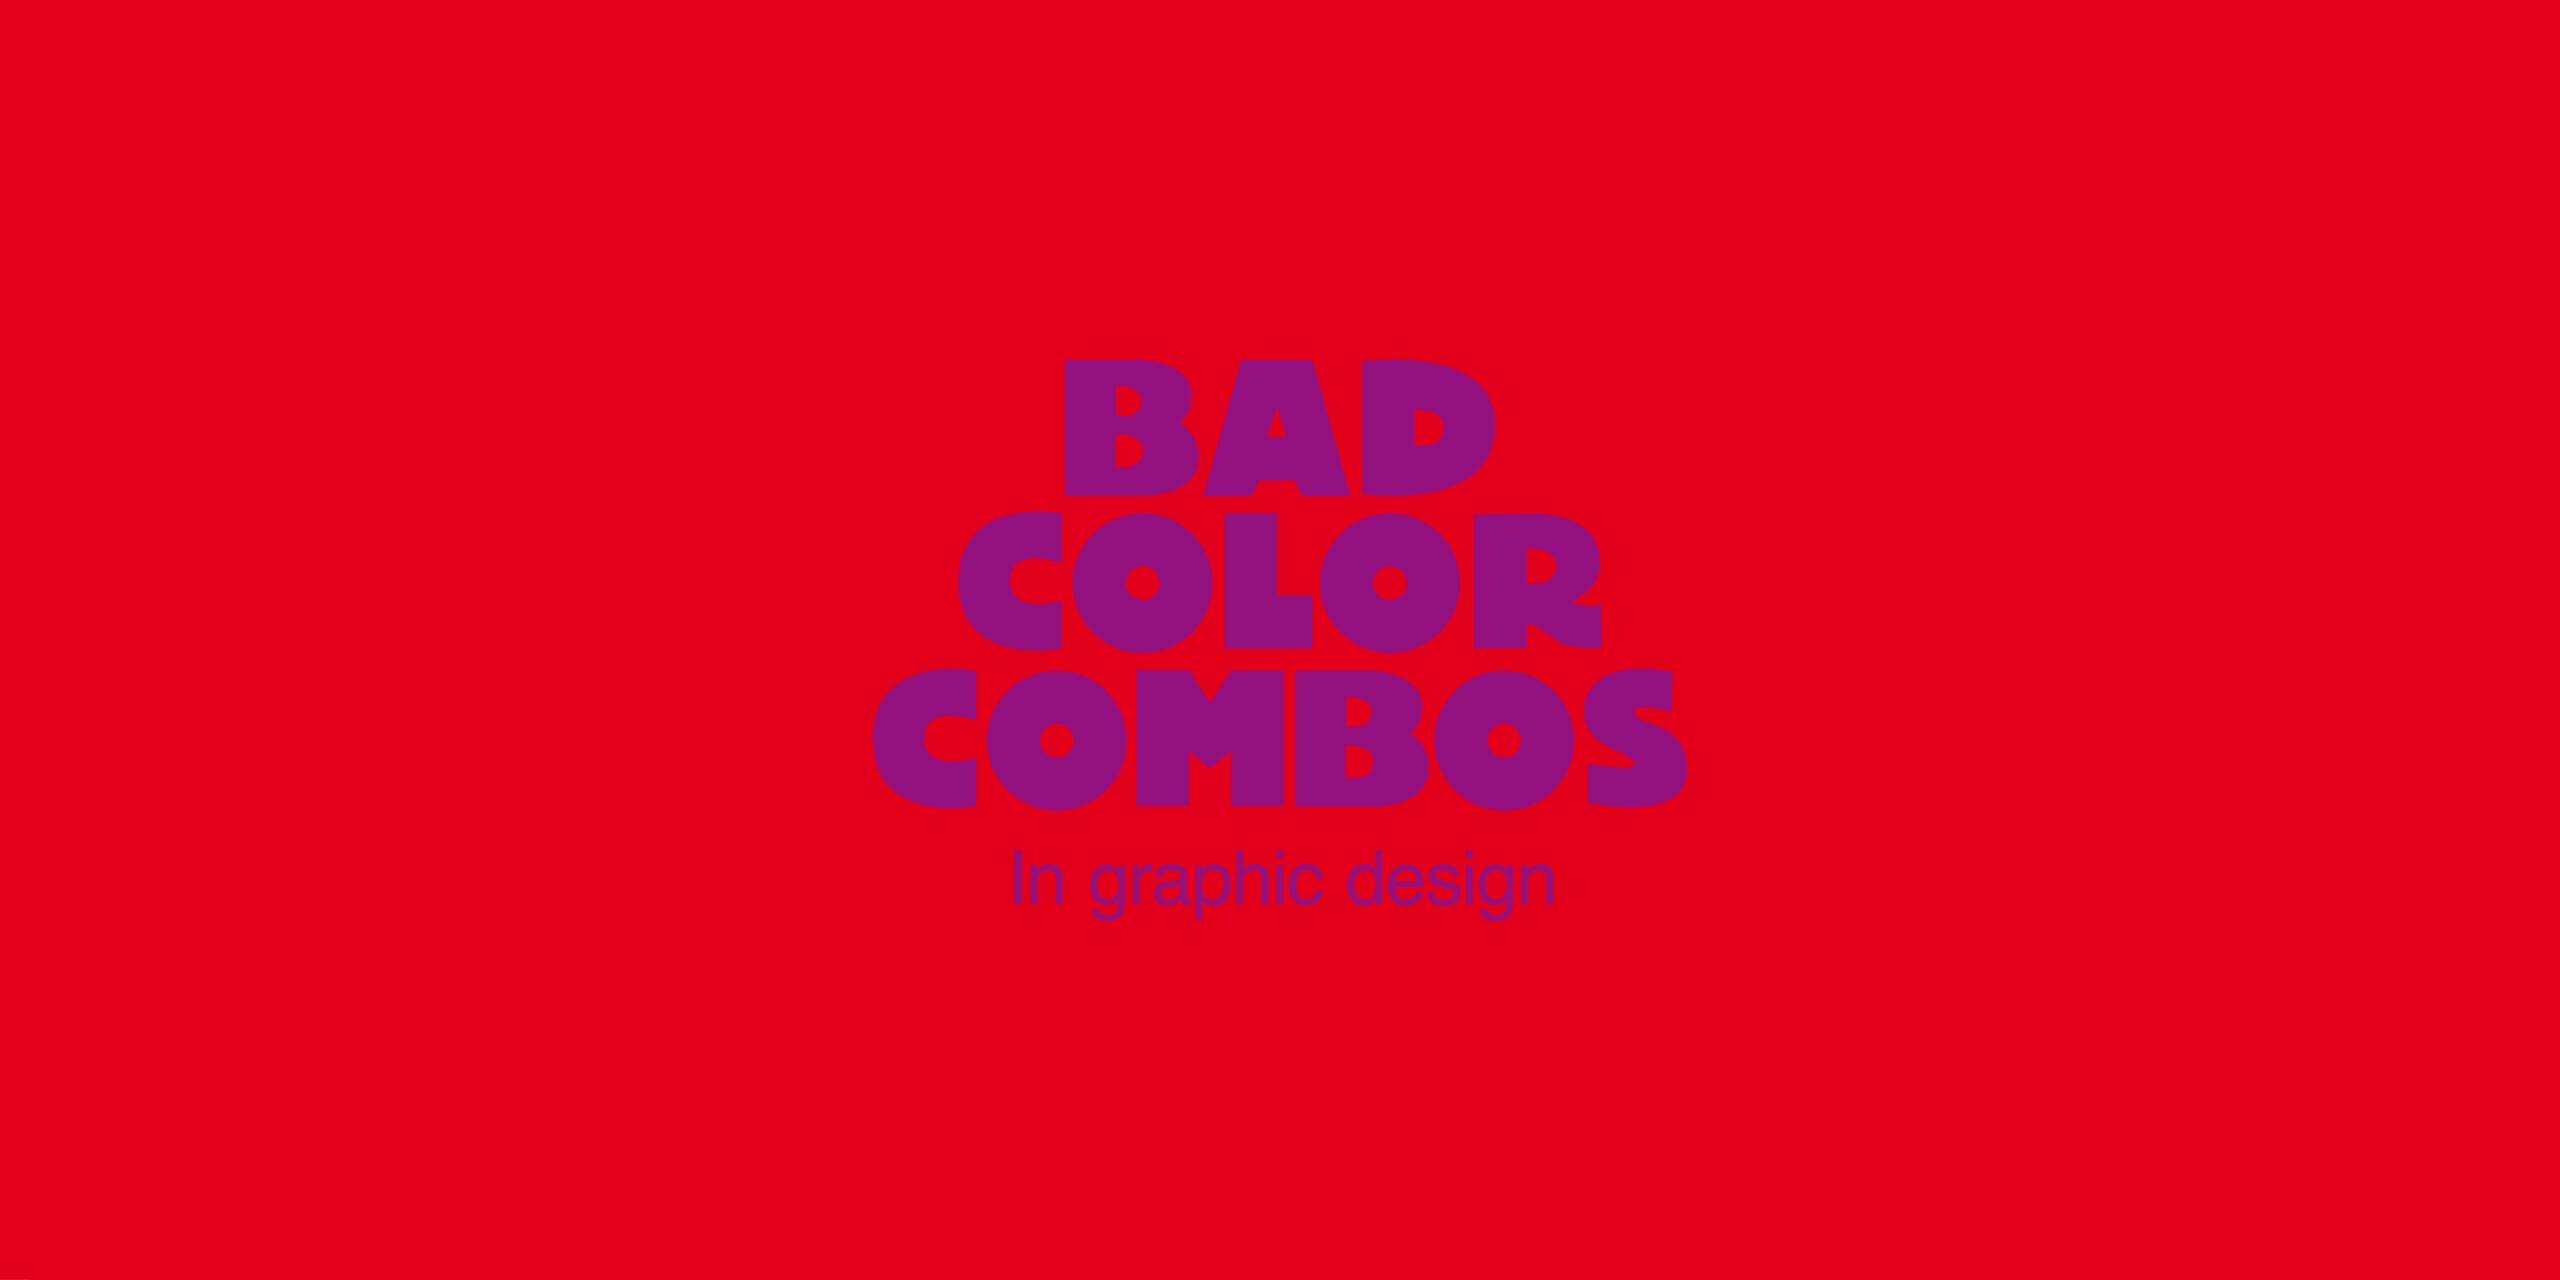 Bad color combos vs good color combos